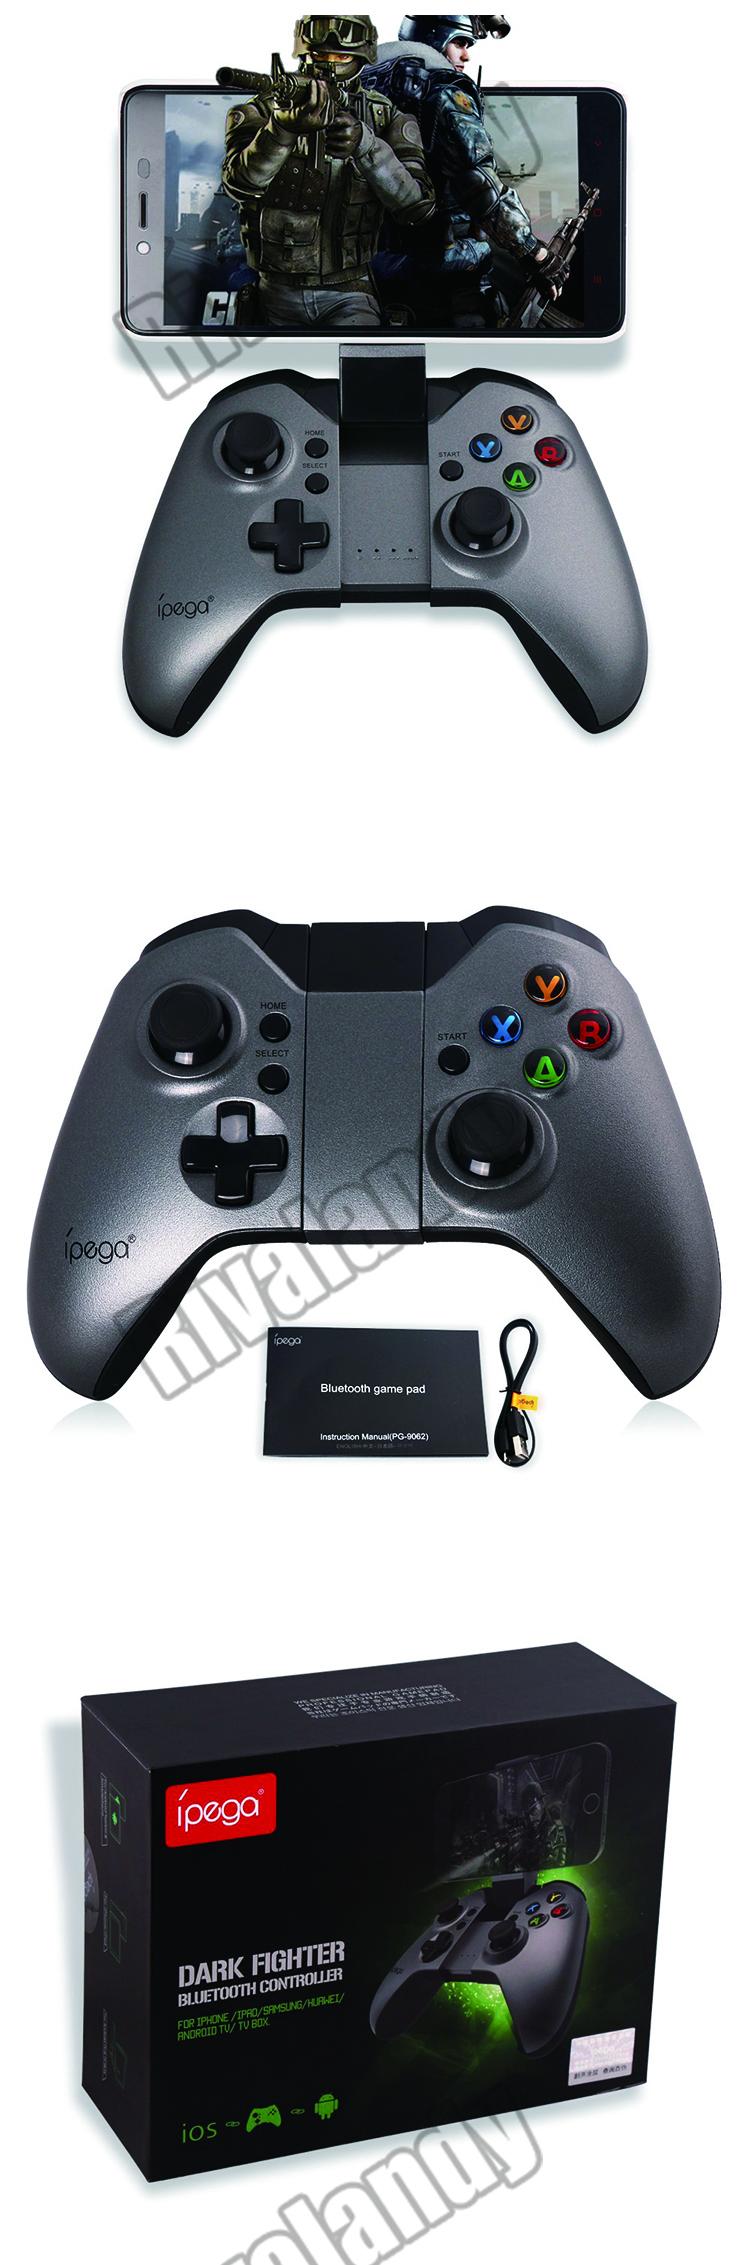 Vr Gamepad Vibration Pc Usb Gamepad Controller Driver Vr Joystick ...